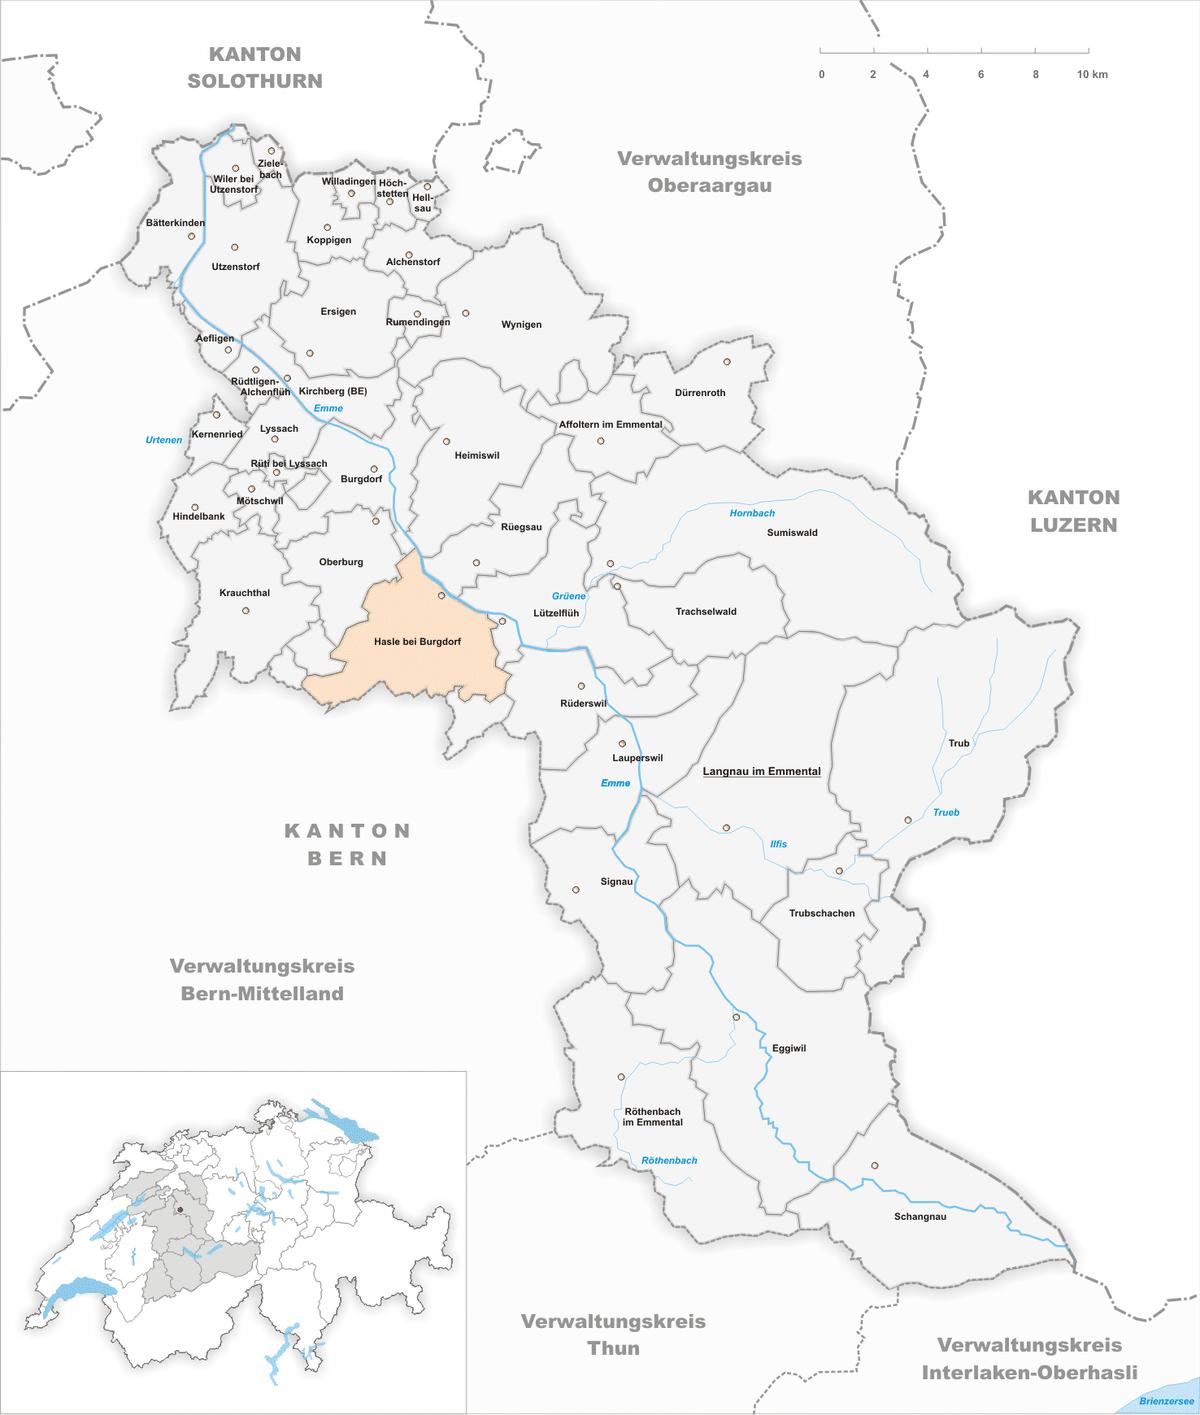 Hasle bei Burgdorf